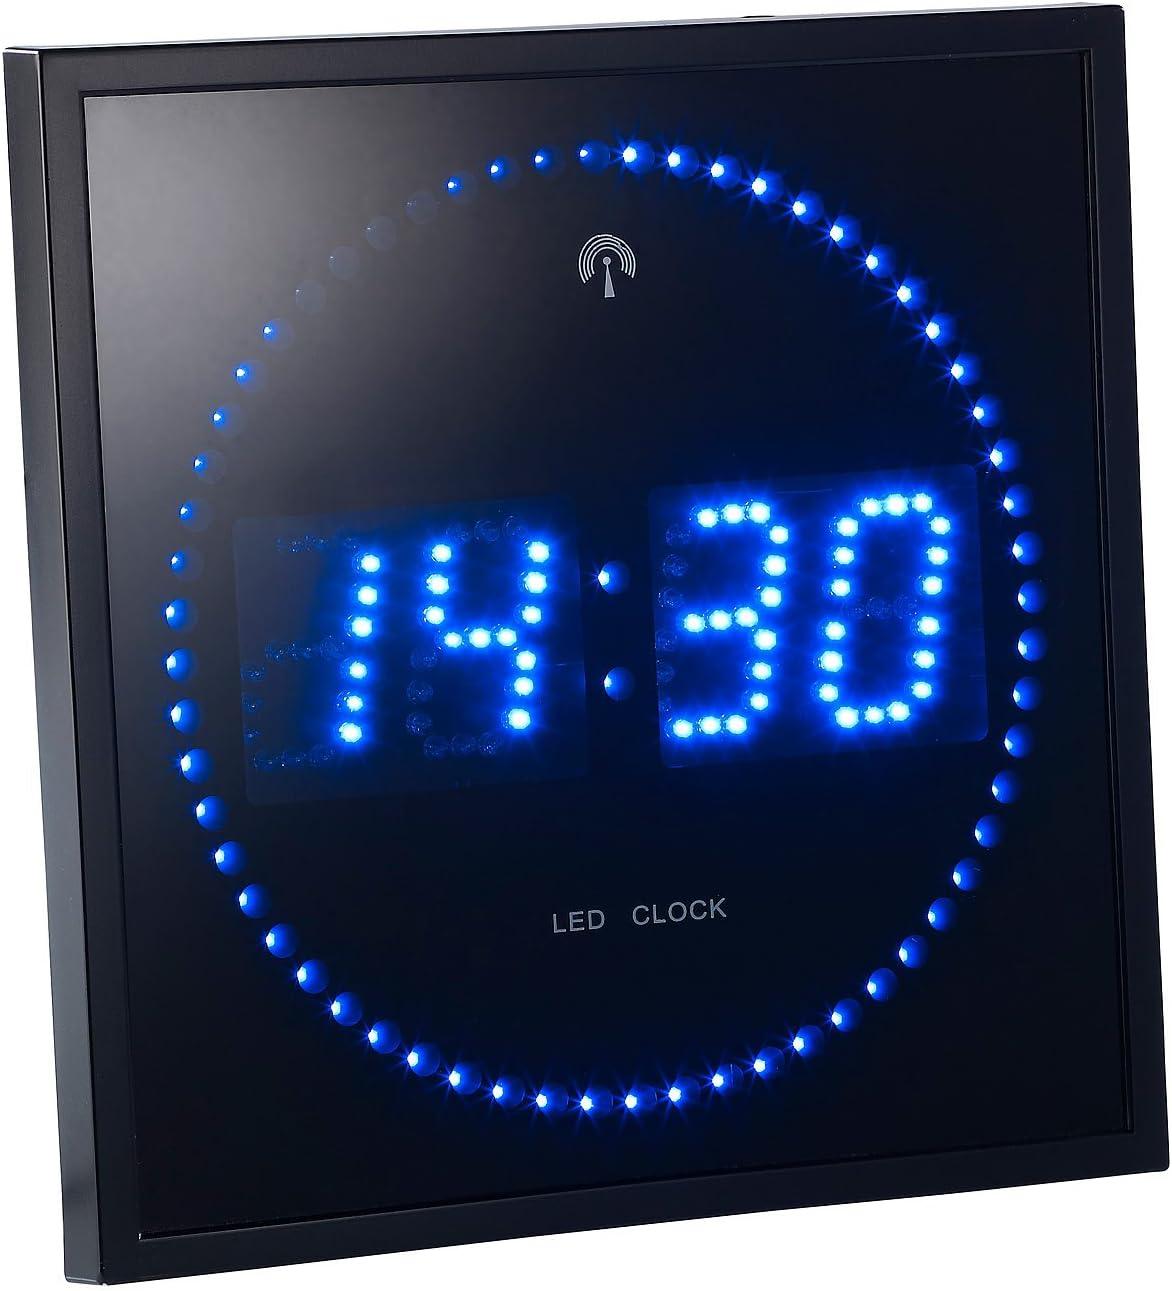 Details about  /LED Clock Fender Telecaster LED Light Vinyl Record Wall Clock LED Wall Clock1963